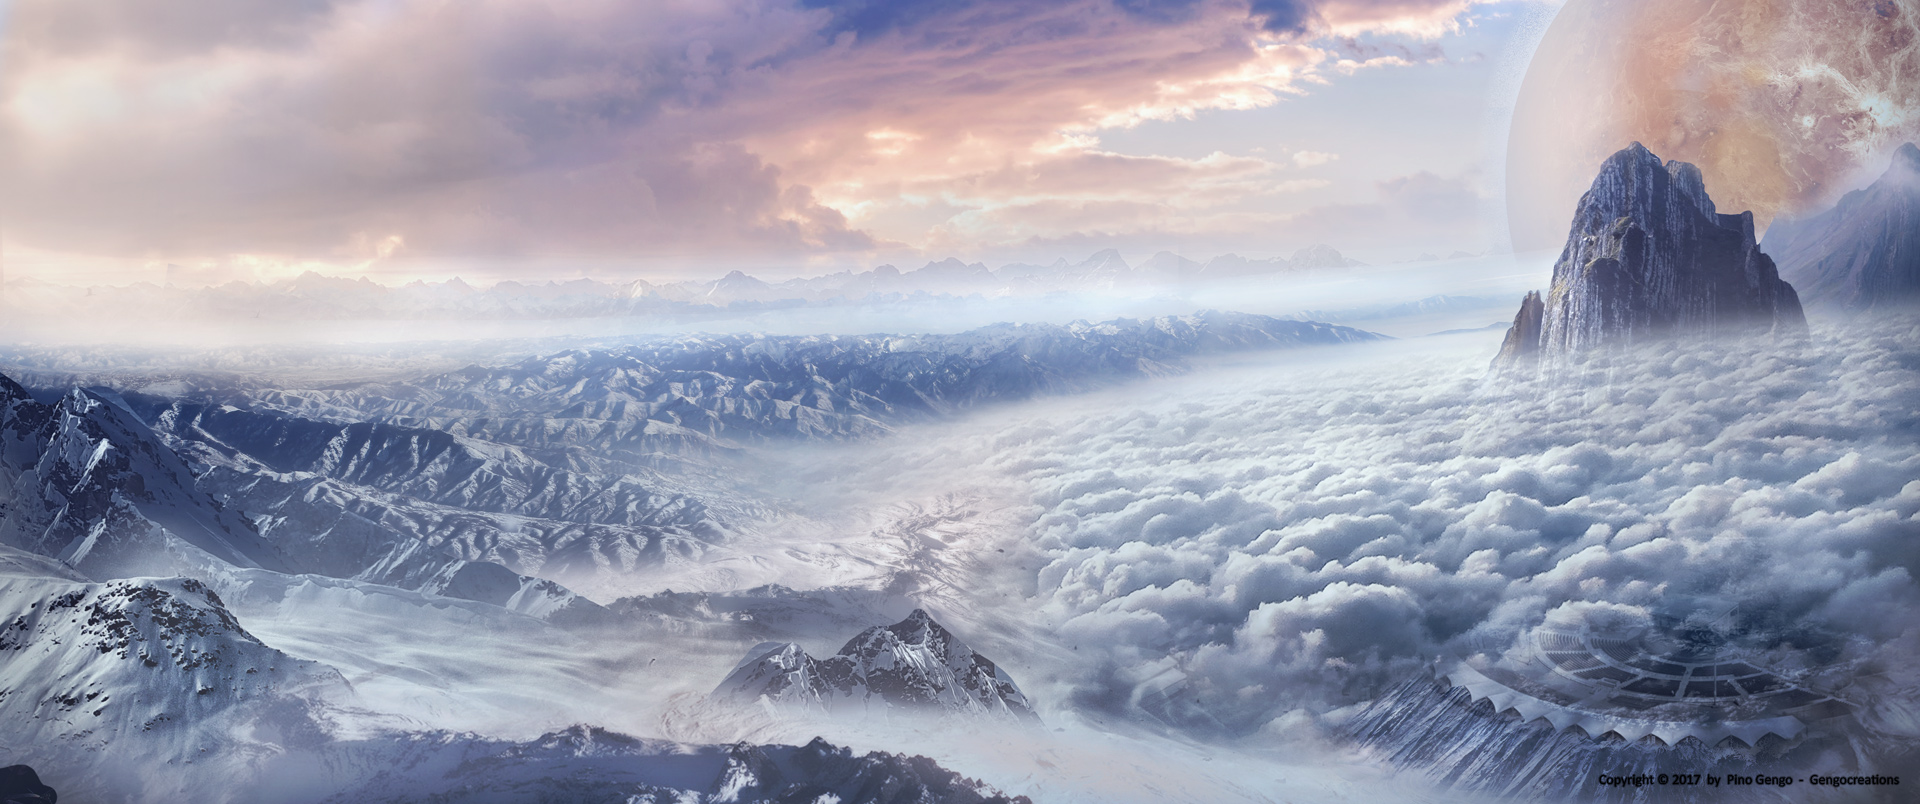 Pino Gengo: Sky Landscape - Matte Painting